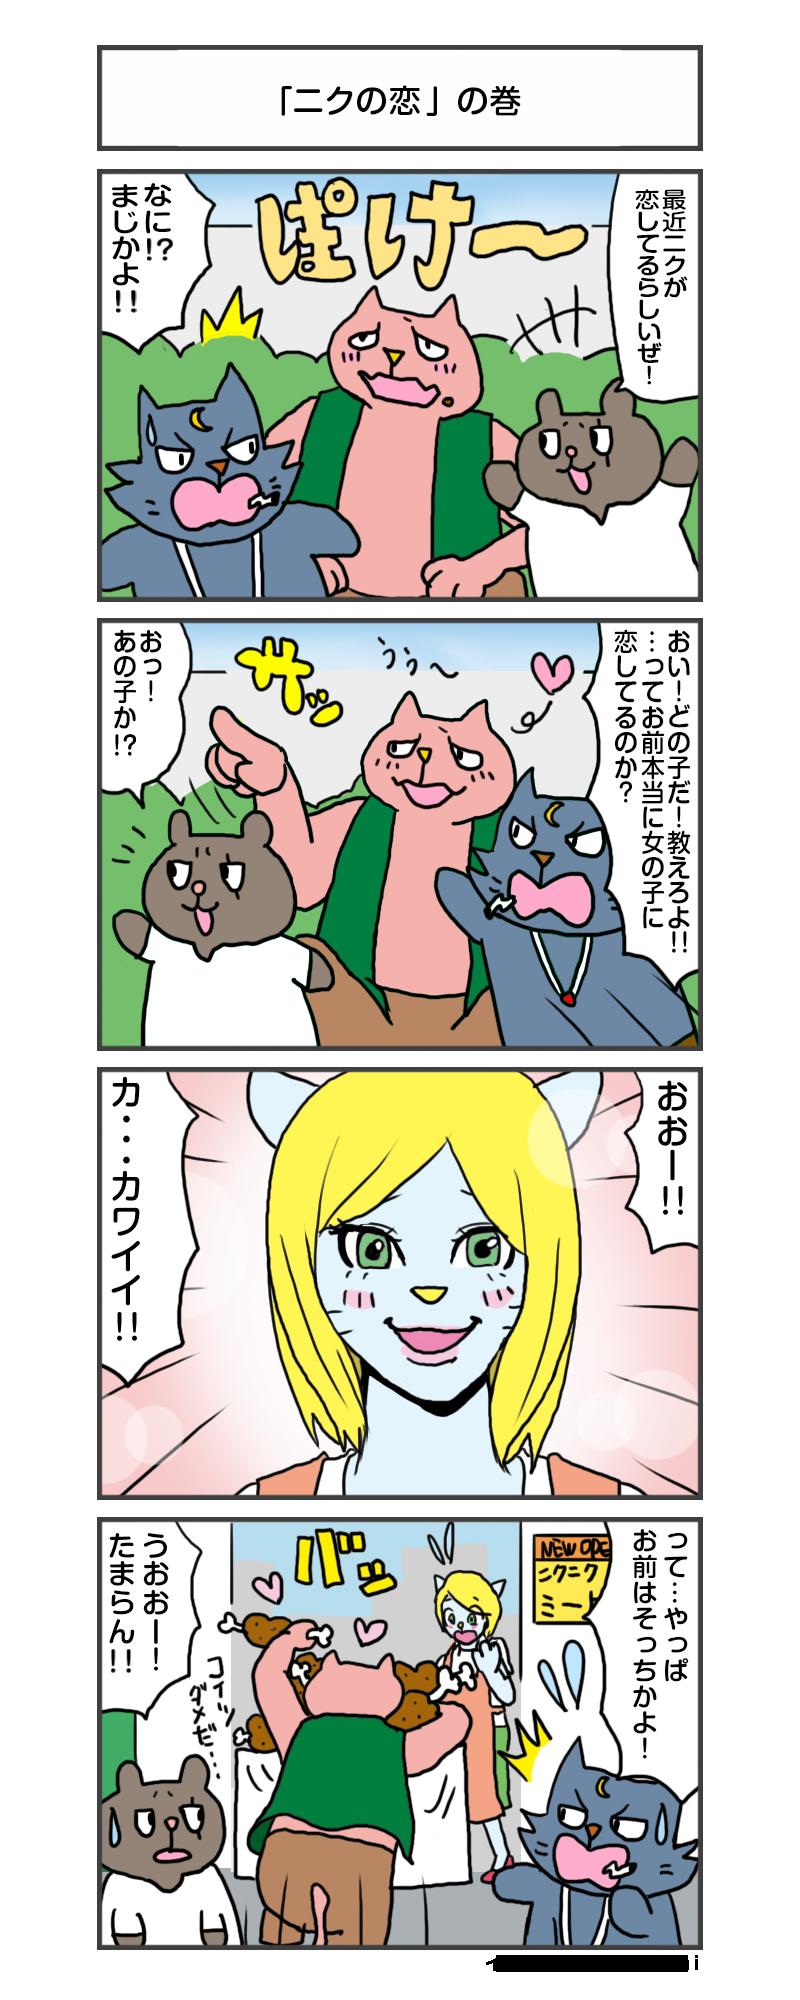 manga_vol.248